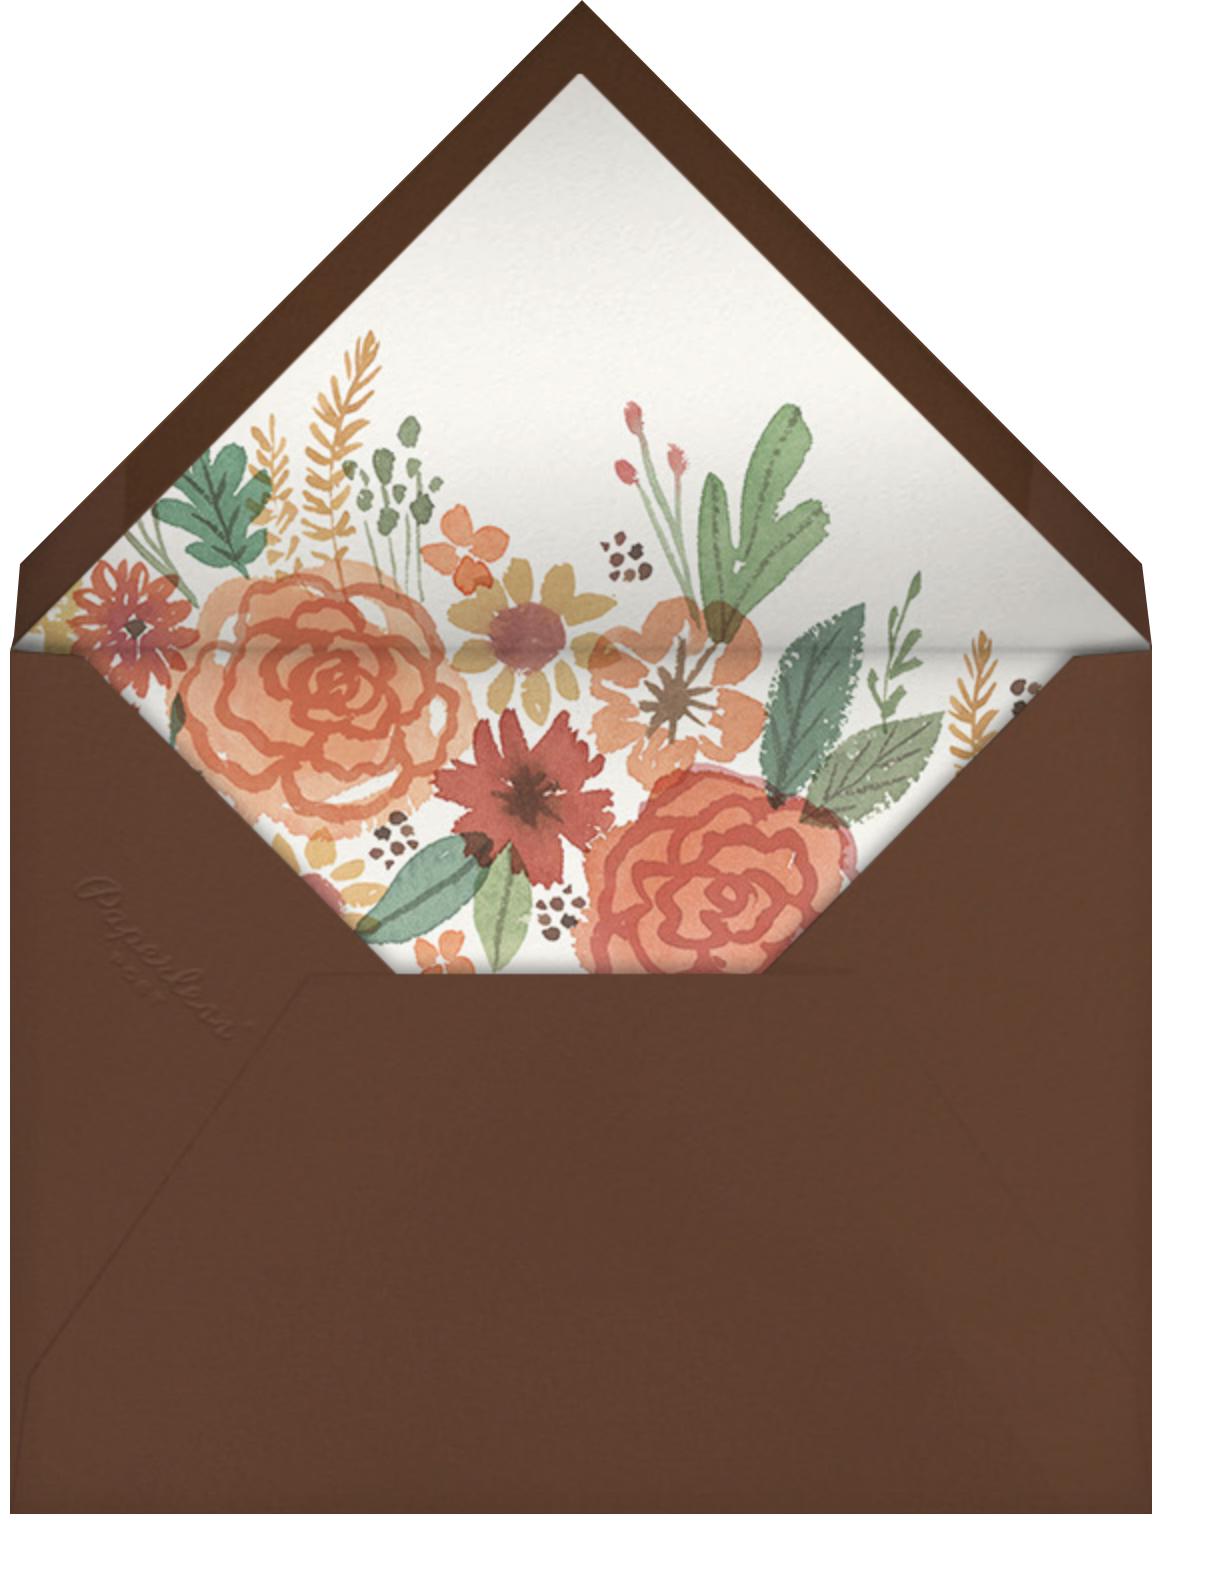 Autumn Garland - Paperless Post - Envelope